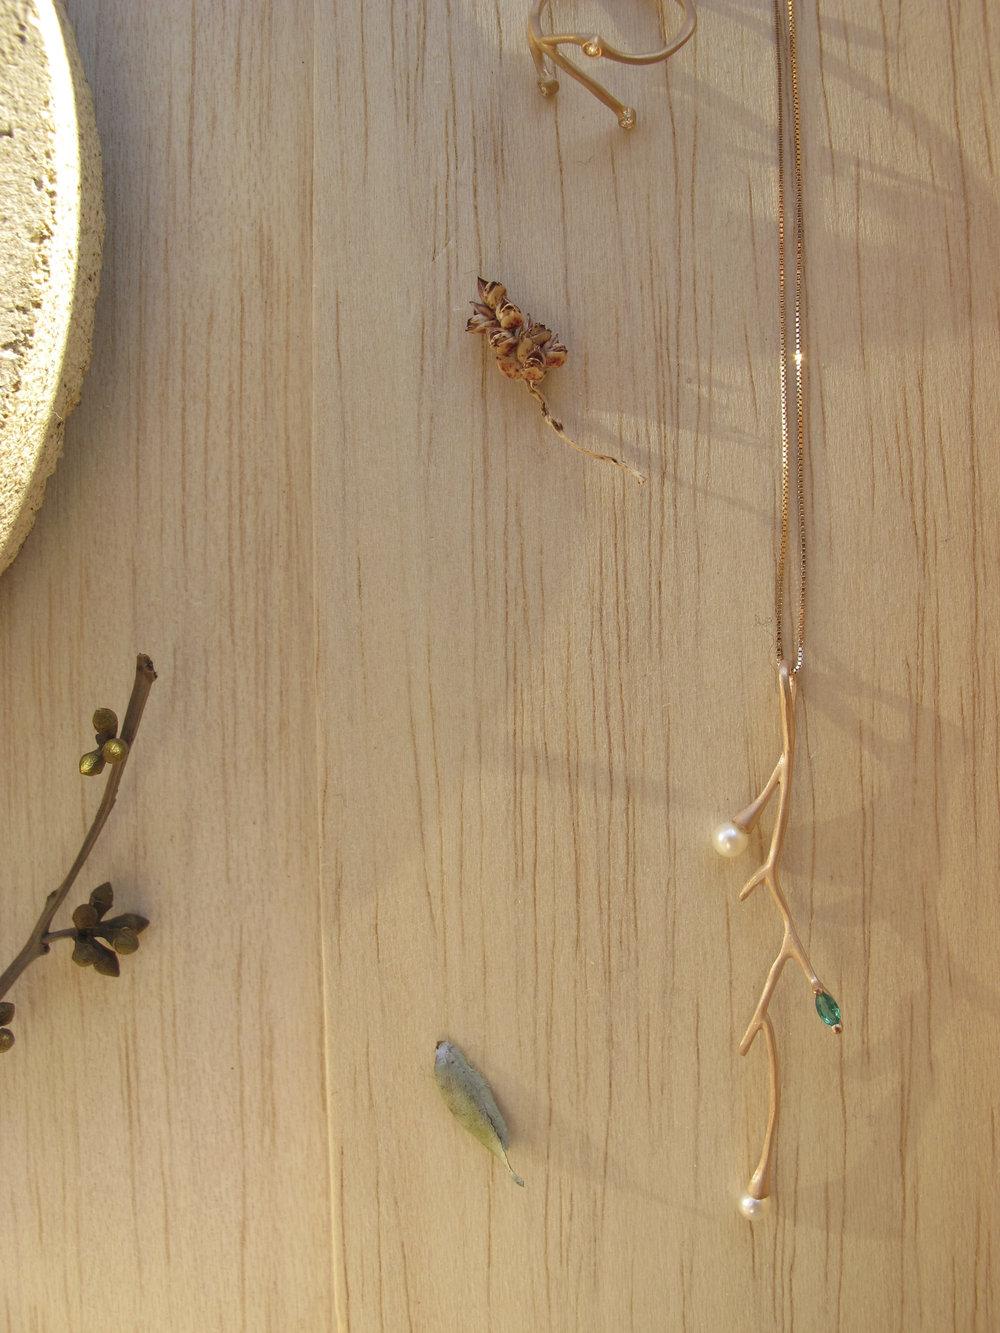 pingente germinar fabimalavazi ouro esmeralda e pérola.jpg